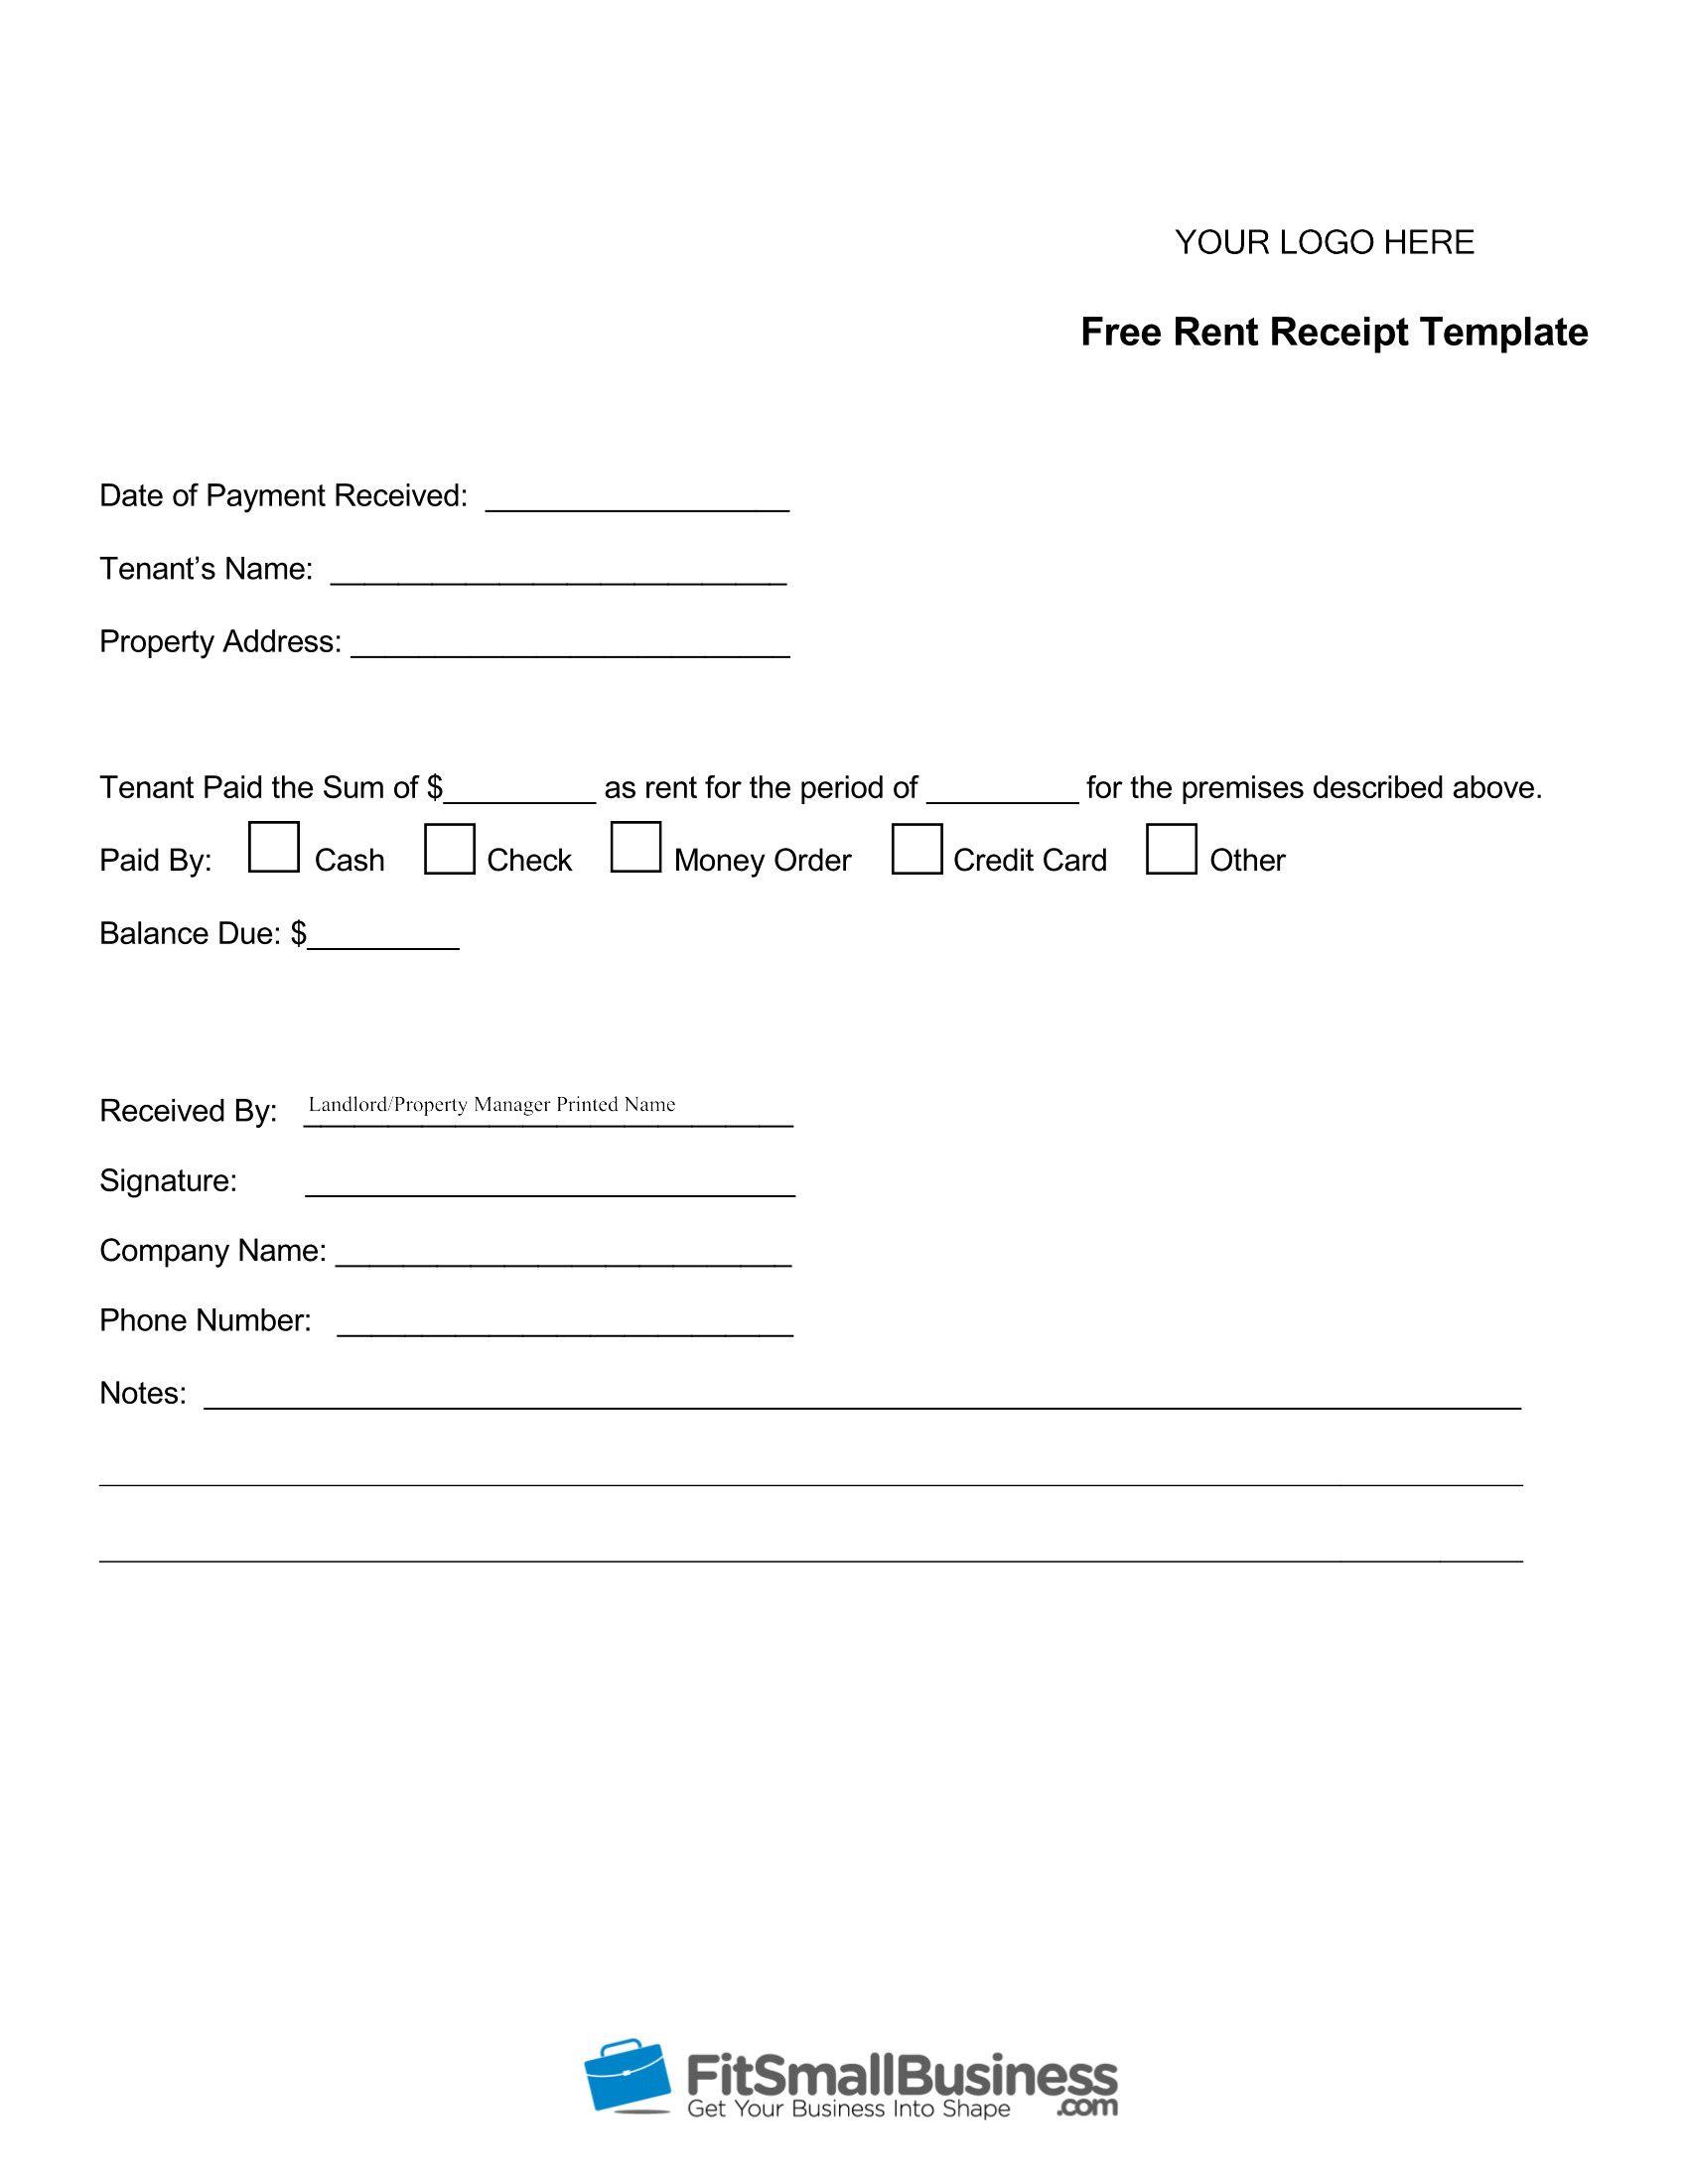 Rent Receipt Template Receipt Template Templates Business Newsletter Templates